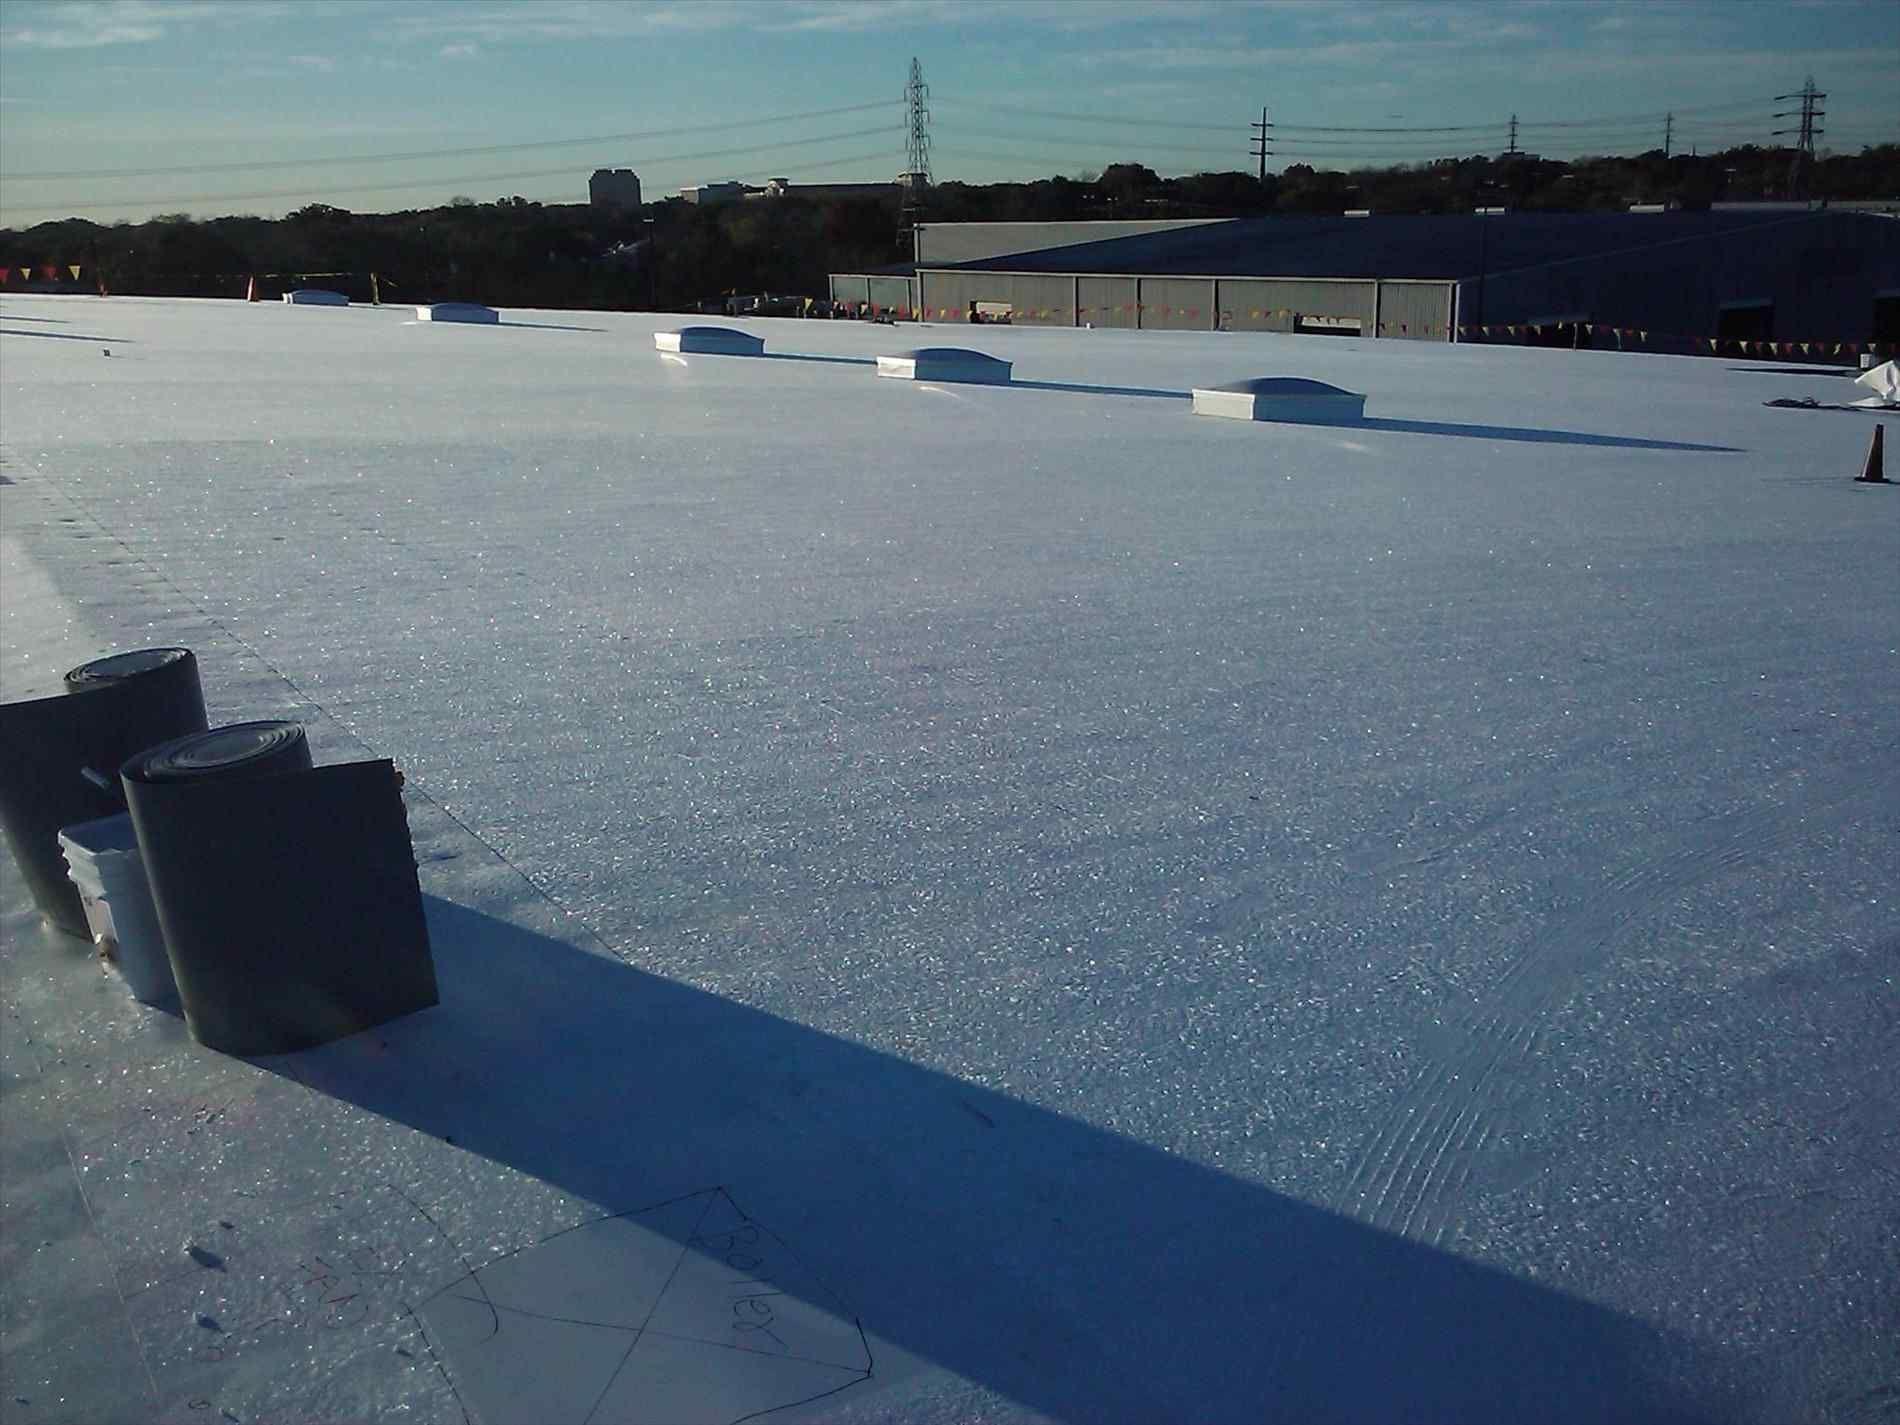 Firestone Metal Roof Metal roof, Roof, Types of roofing